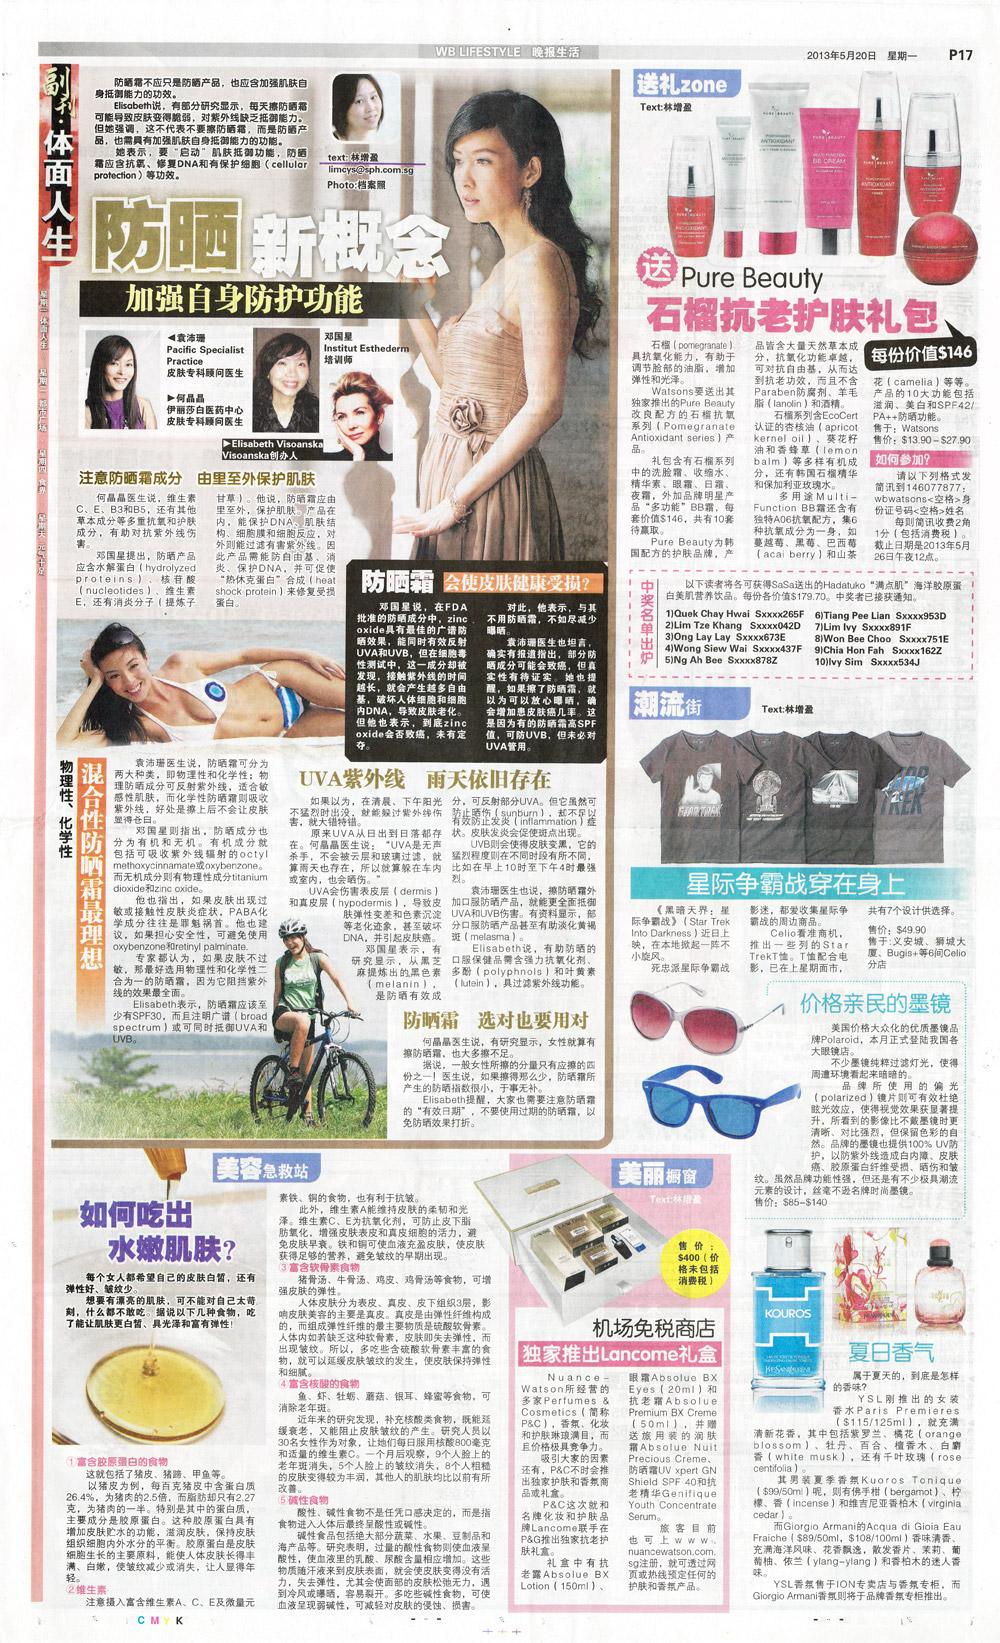 2013-05-20-Wan-Bao-Dr-Pat-Yuen-interview-on-suncare